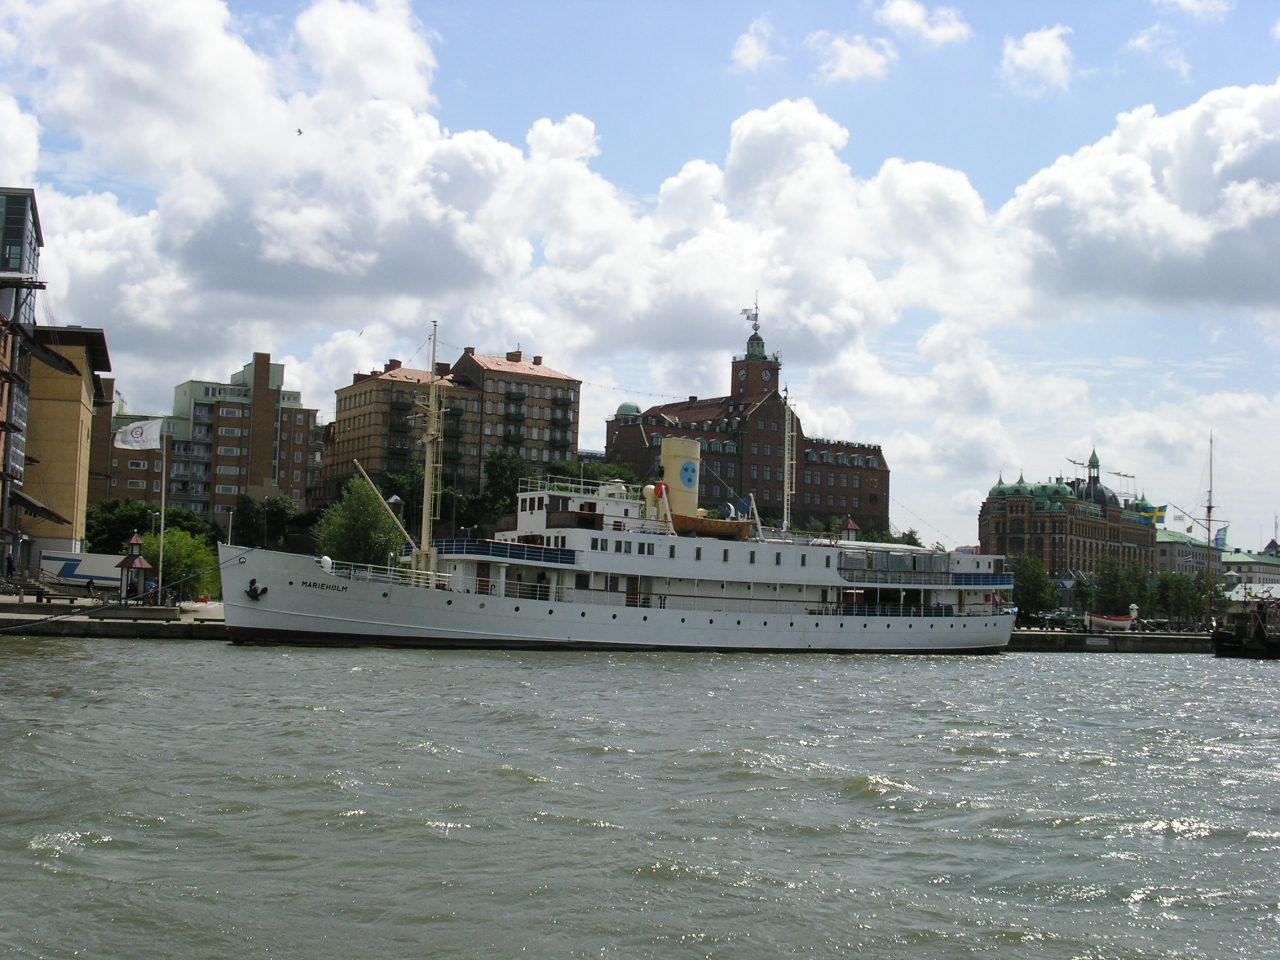 File:SS resurgepillsreview.com - Wikimedia Commons